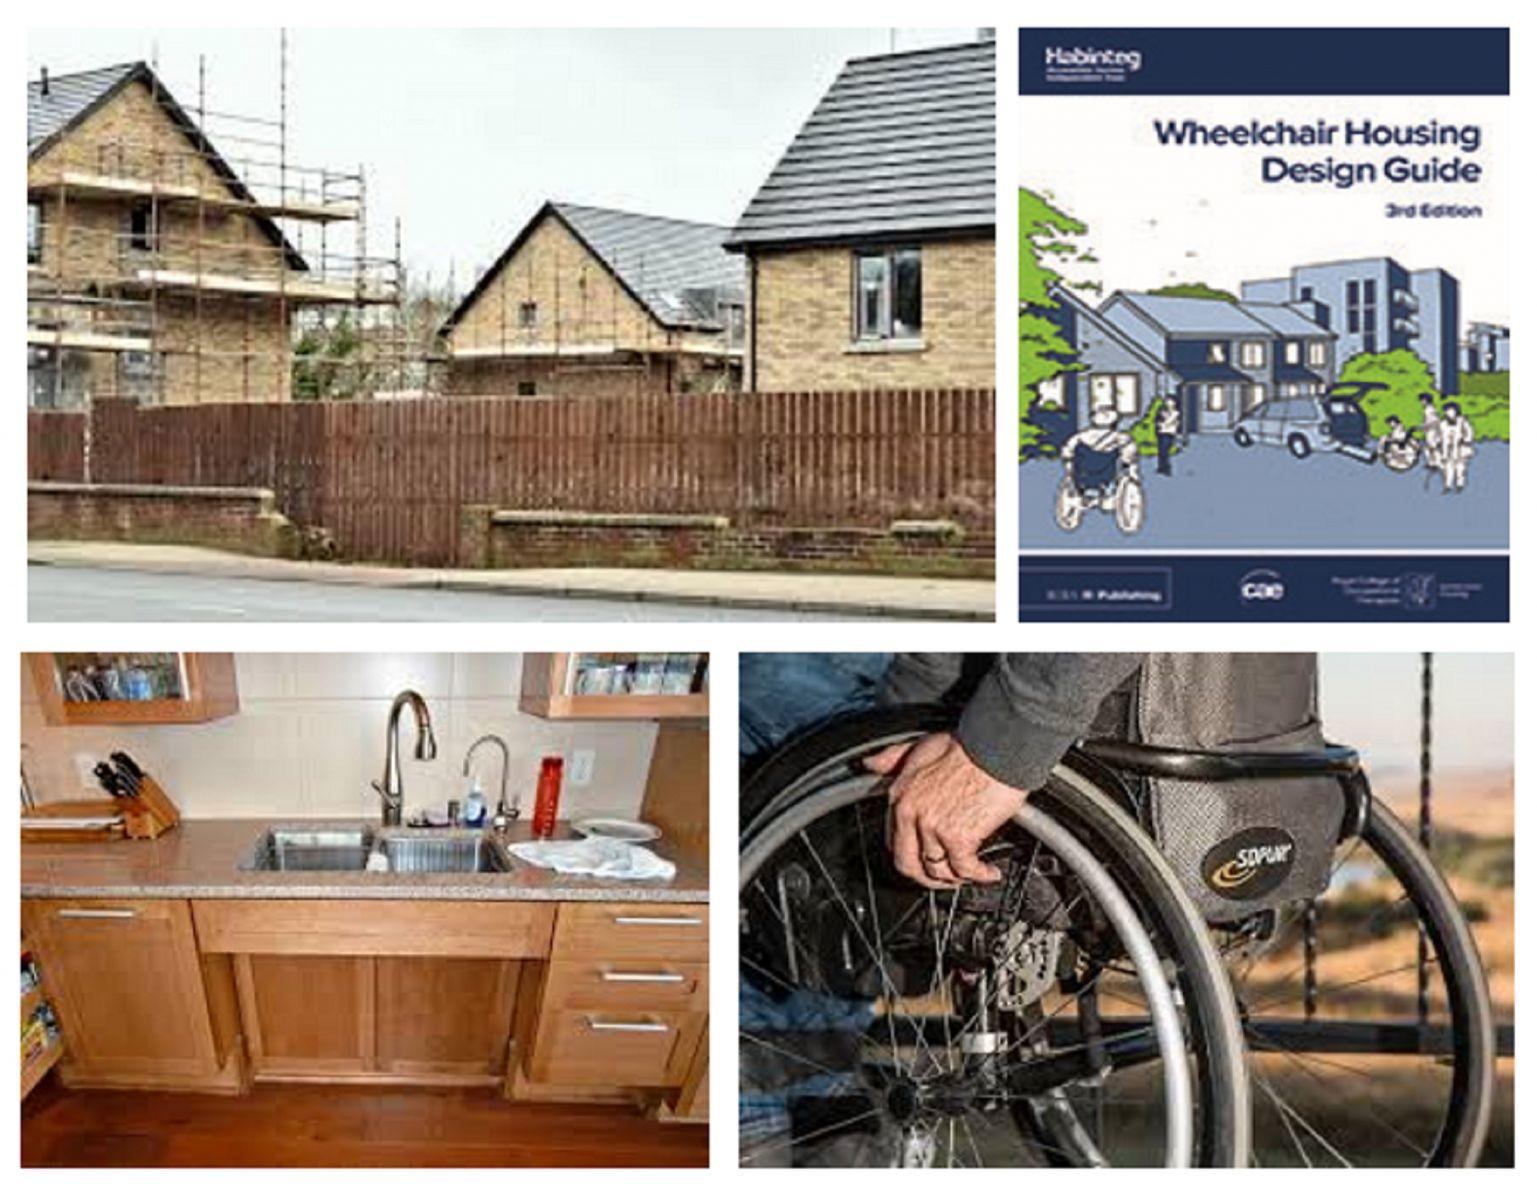 wheelchair housing design guide how to recane a chair habinteg release 3rd edition of